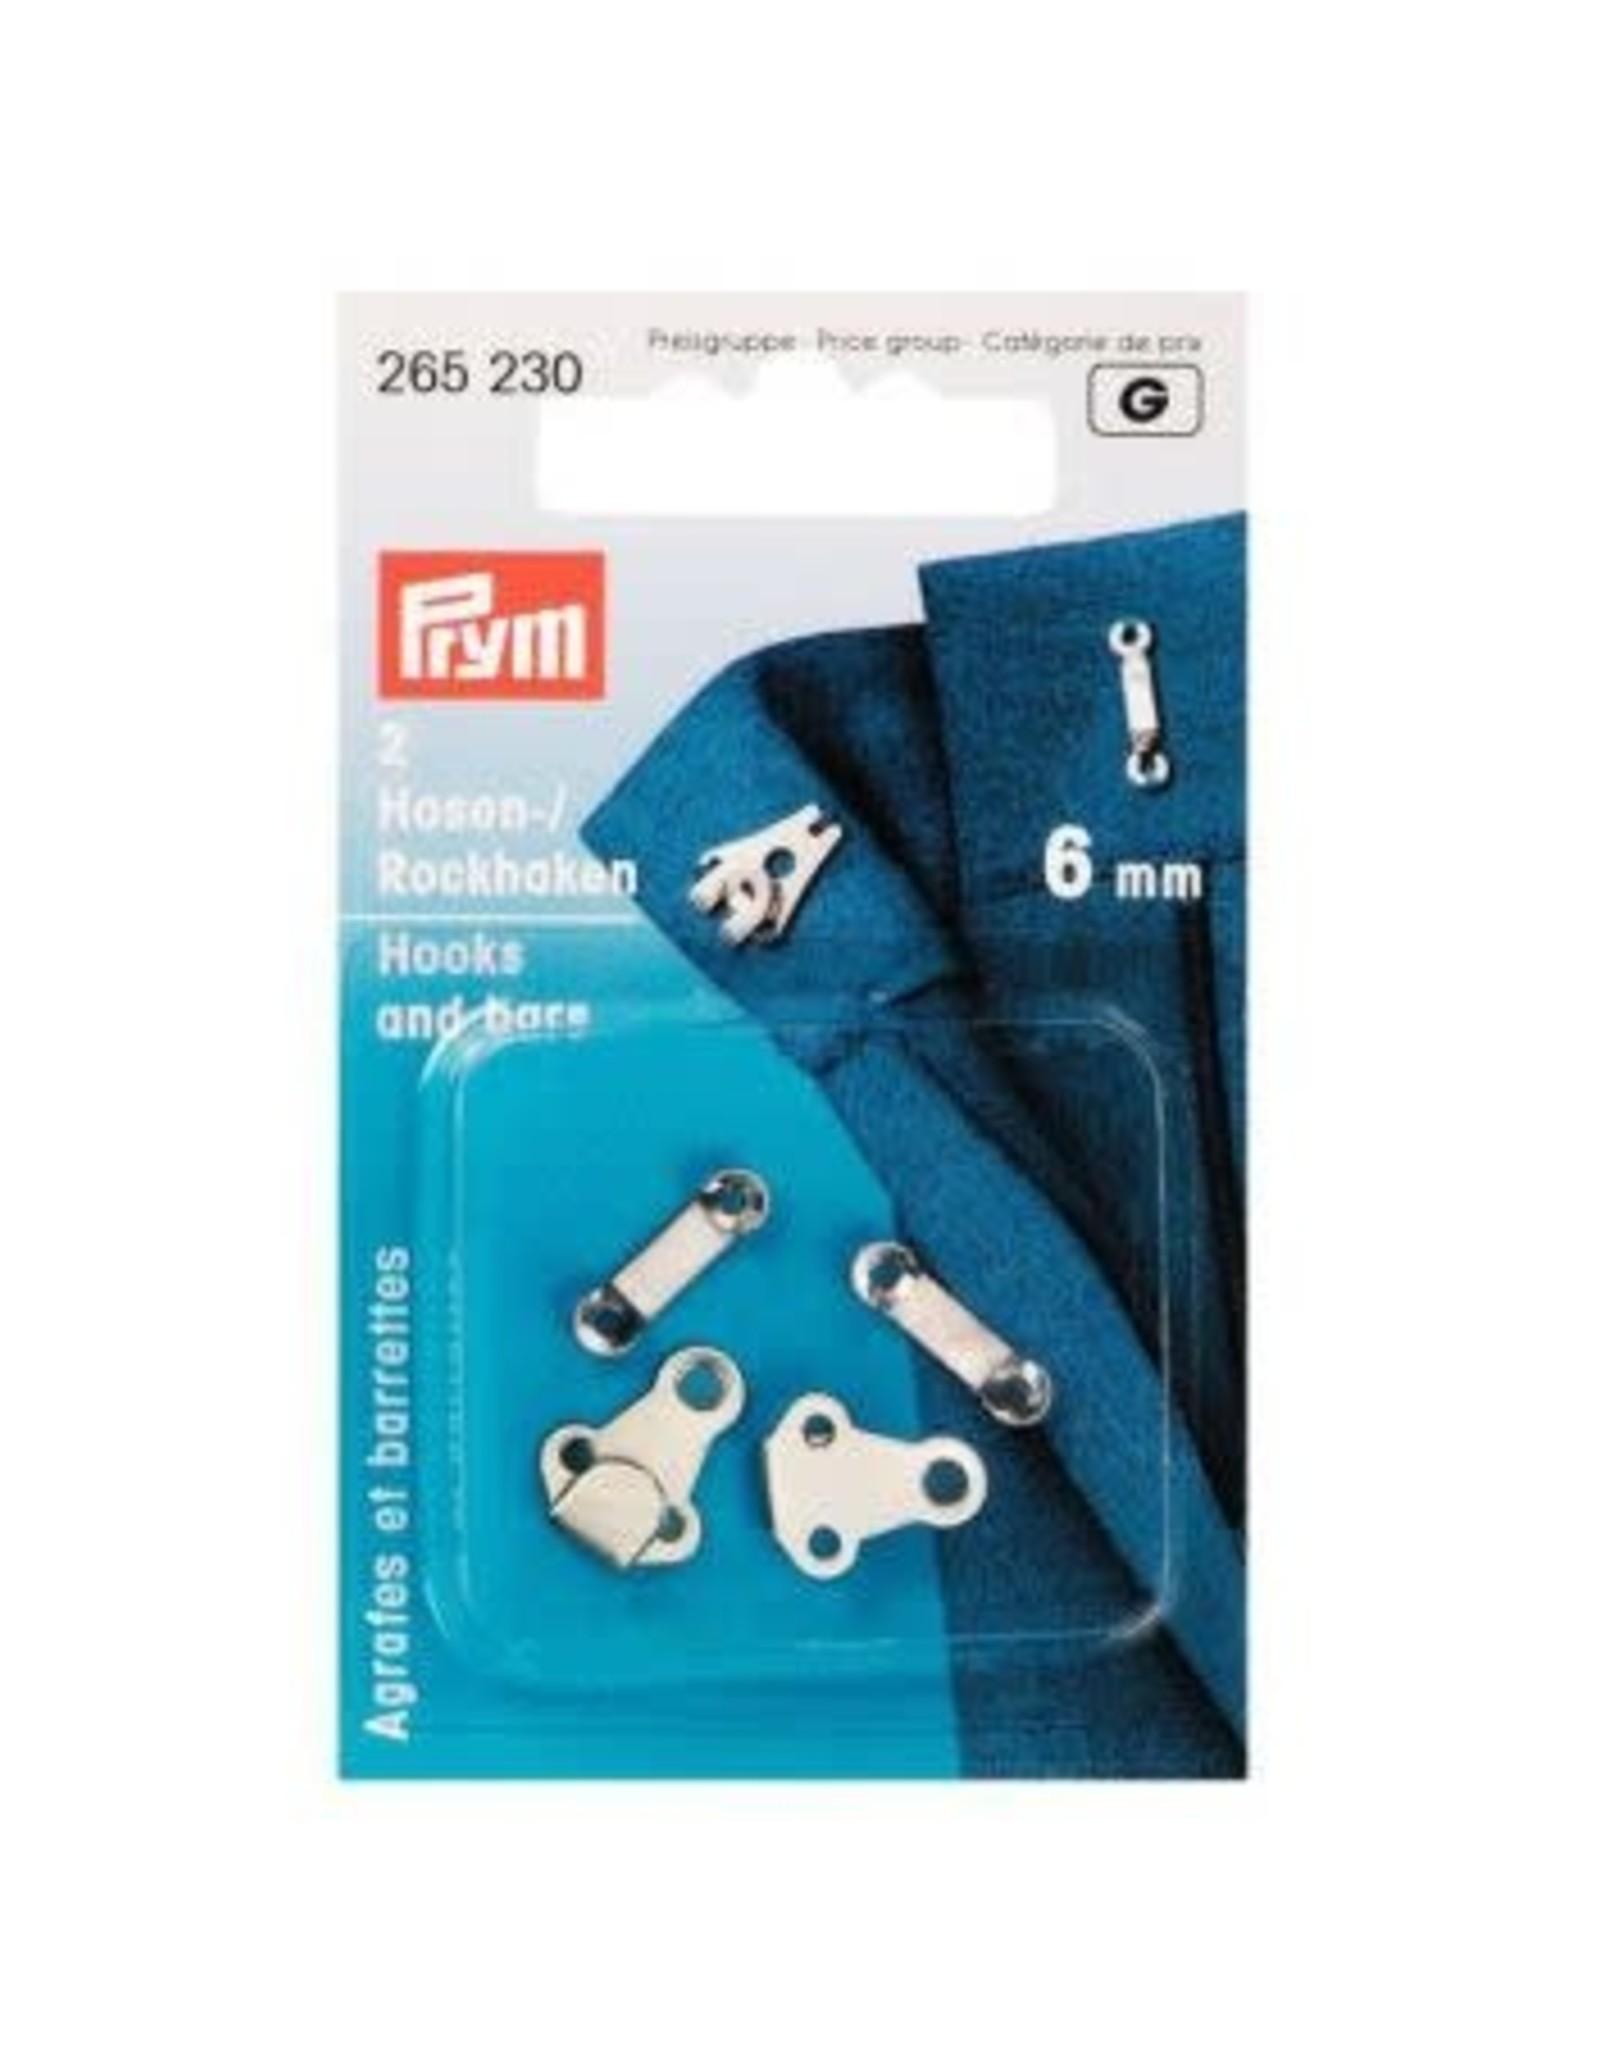 Prym Prym 265.230 - Broek- en rokhaken 6mm